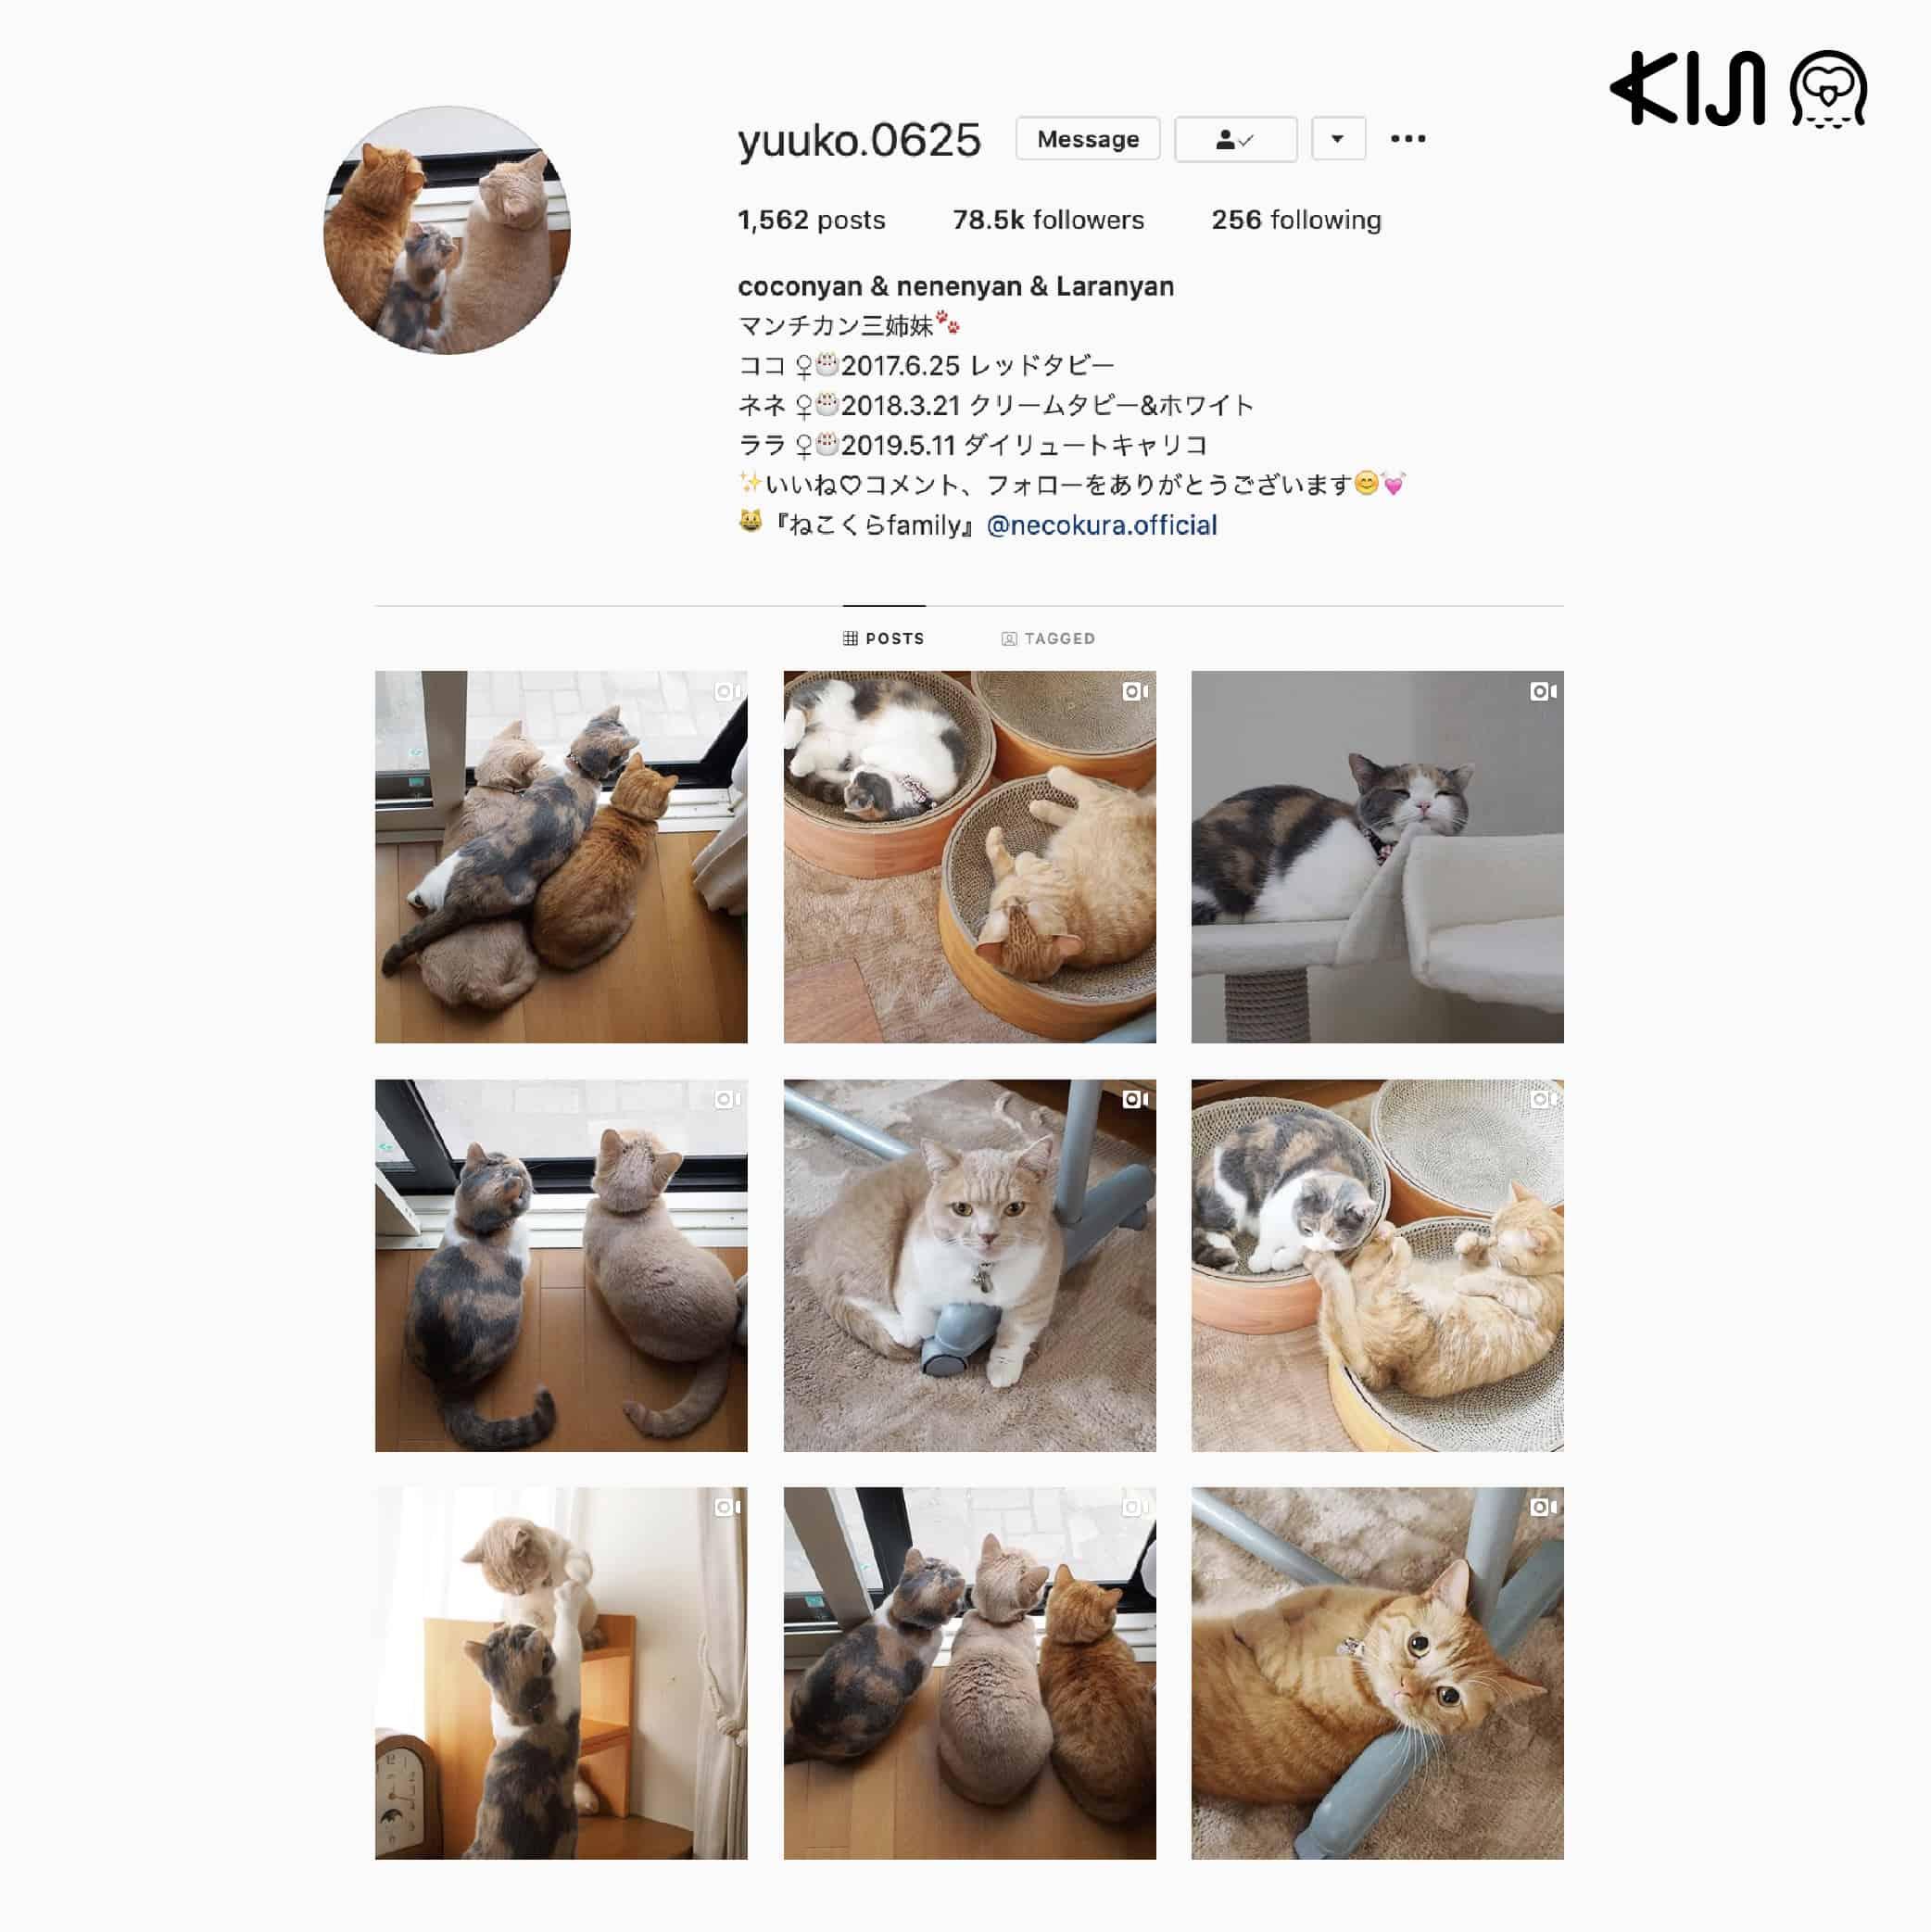 Coco, Nene และ Lara เป็นแก๊ง แมวญี่ปุ่น สามใบเถา เจ้าของชอบถ่ายชีวิตประจำวันสนุกๆ ให้ดูอยู่เป็นประจำ